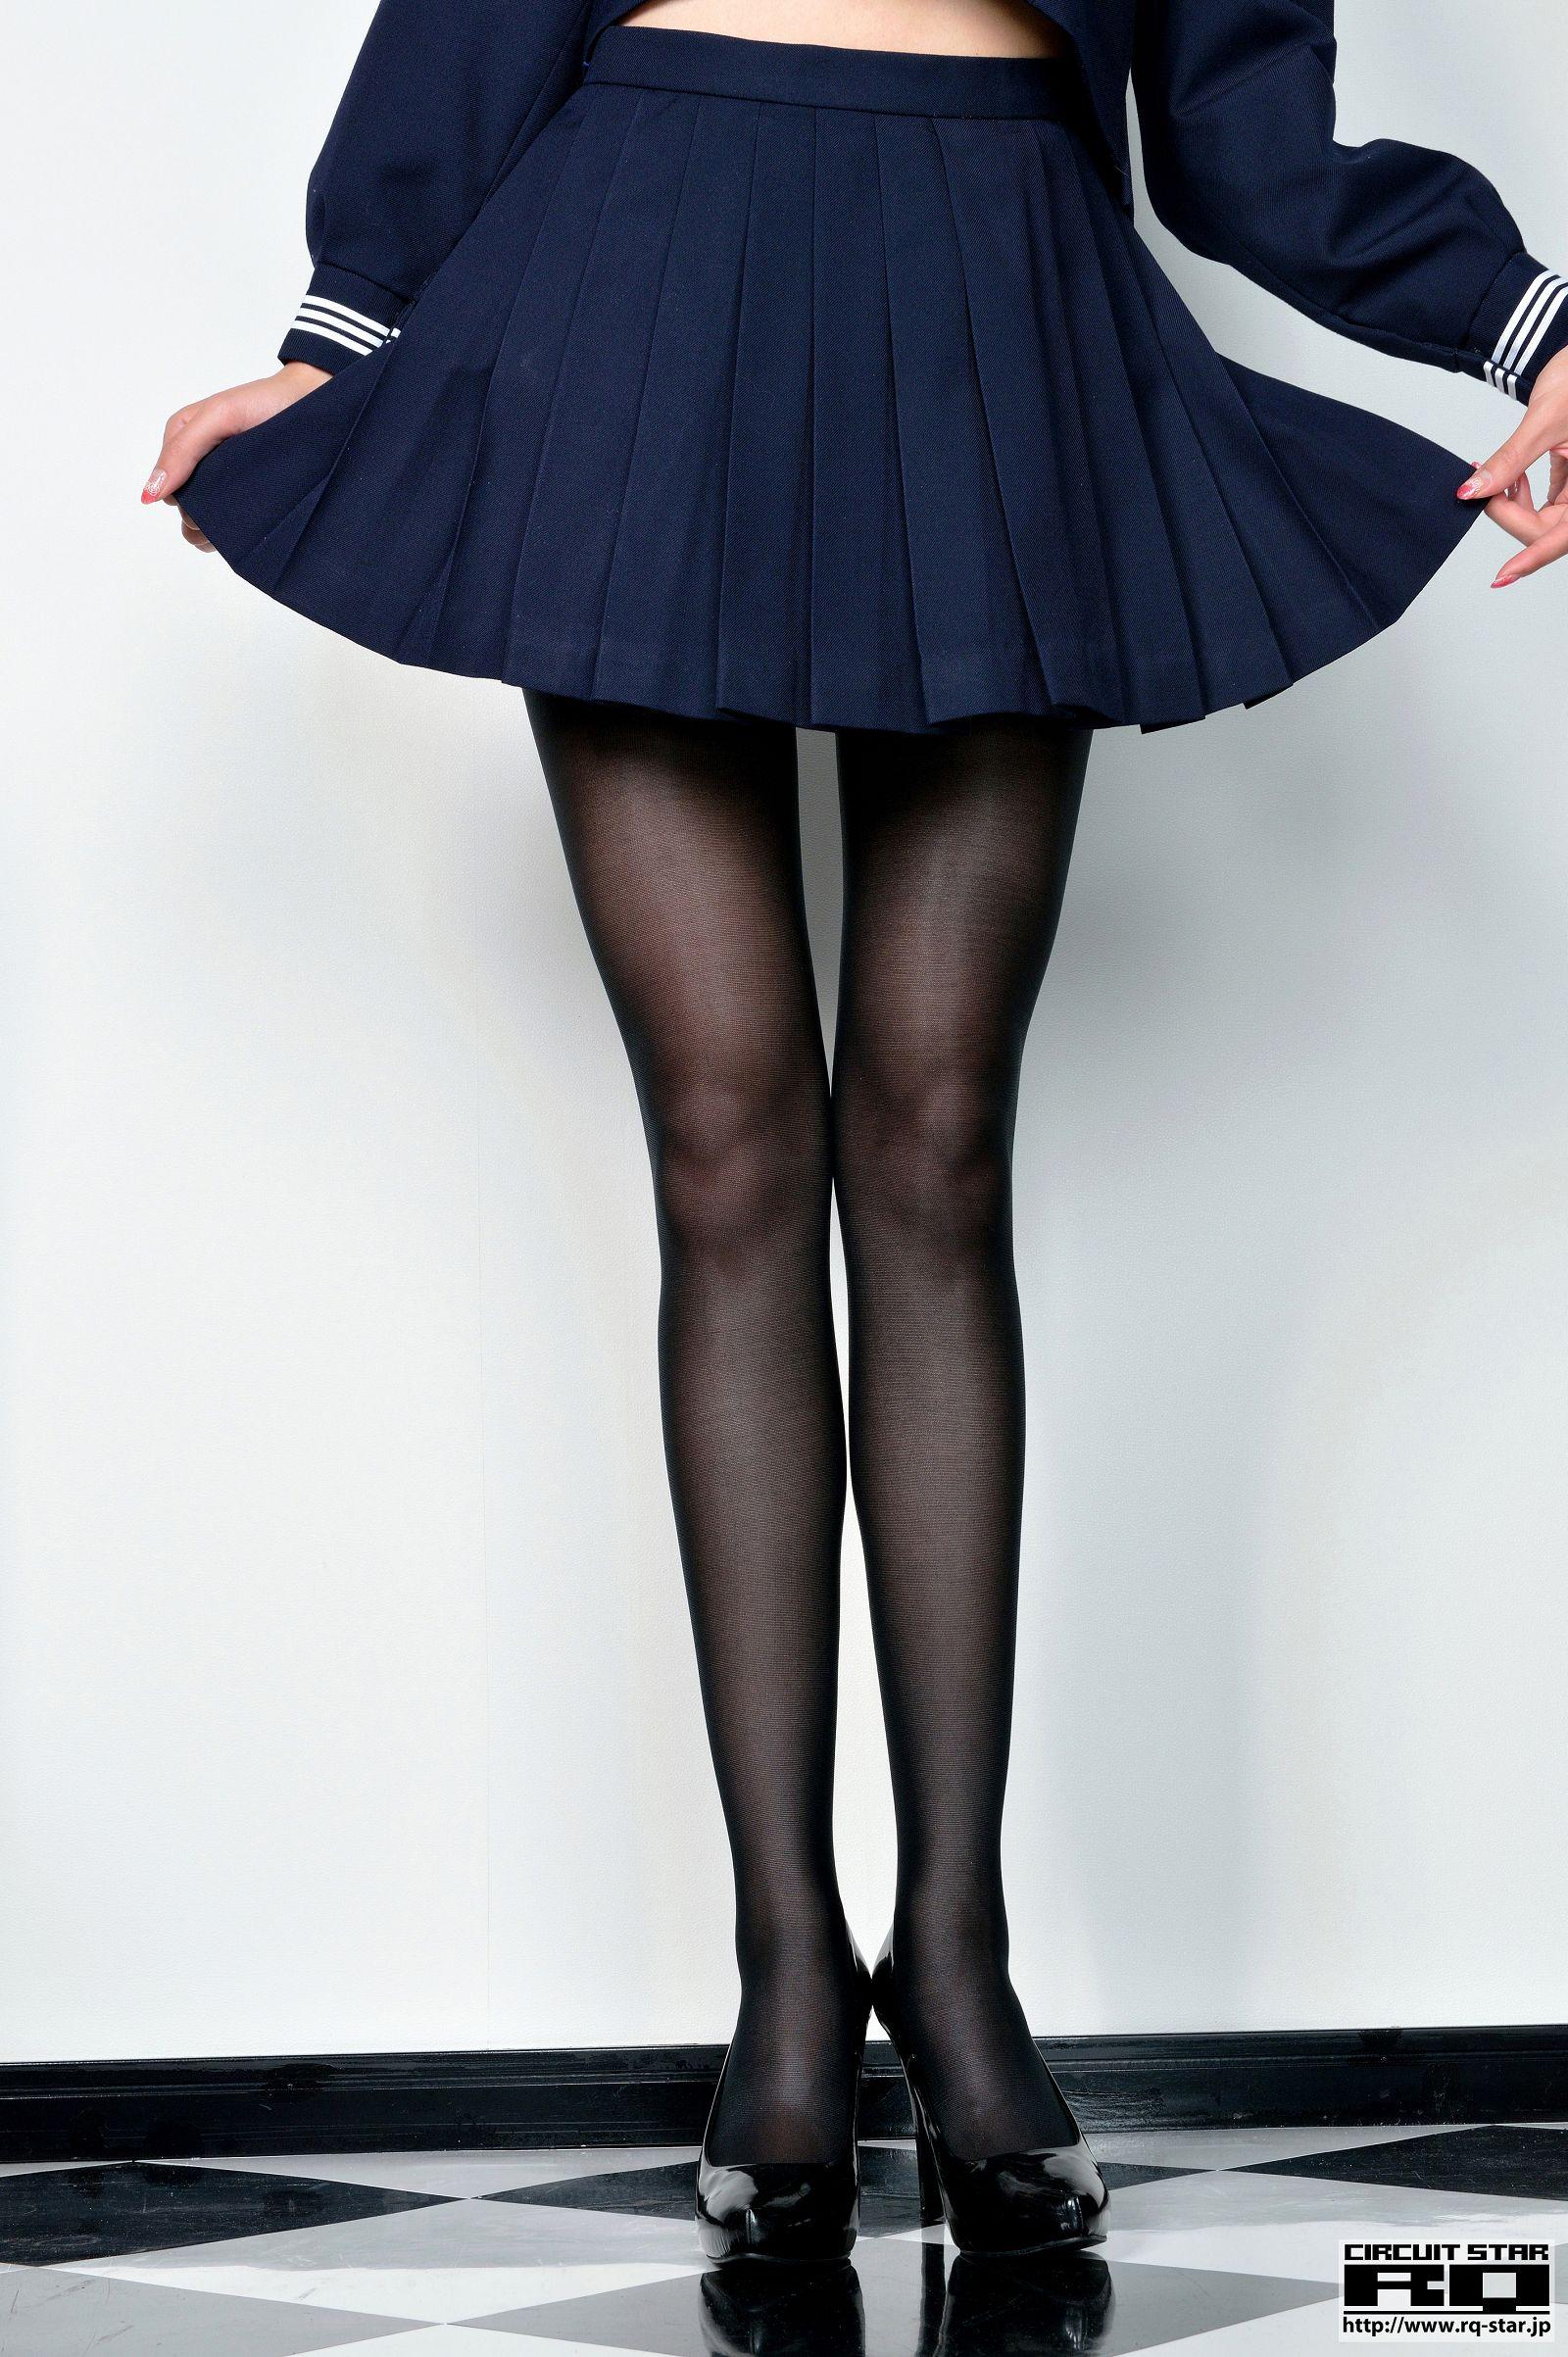 [RQ STAR美女] NO.01058 Miho Abe あべみほ School Girl[90P] RQ STAR 第3张